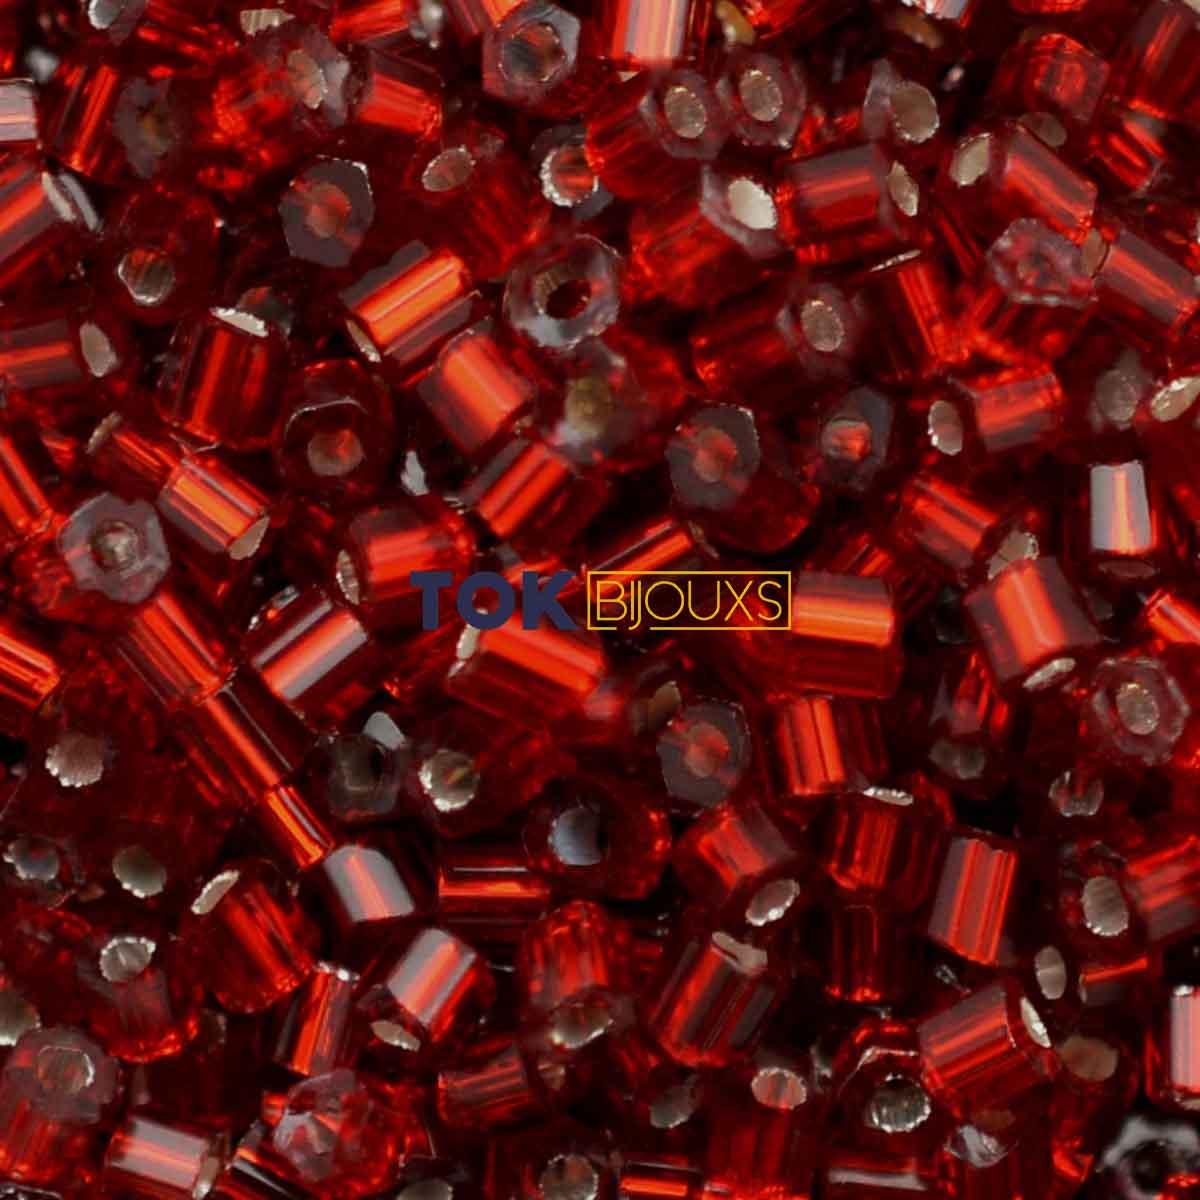 Vidrilho Jablonex - Vermelho Transparente - 500g